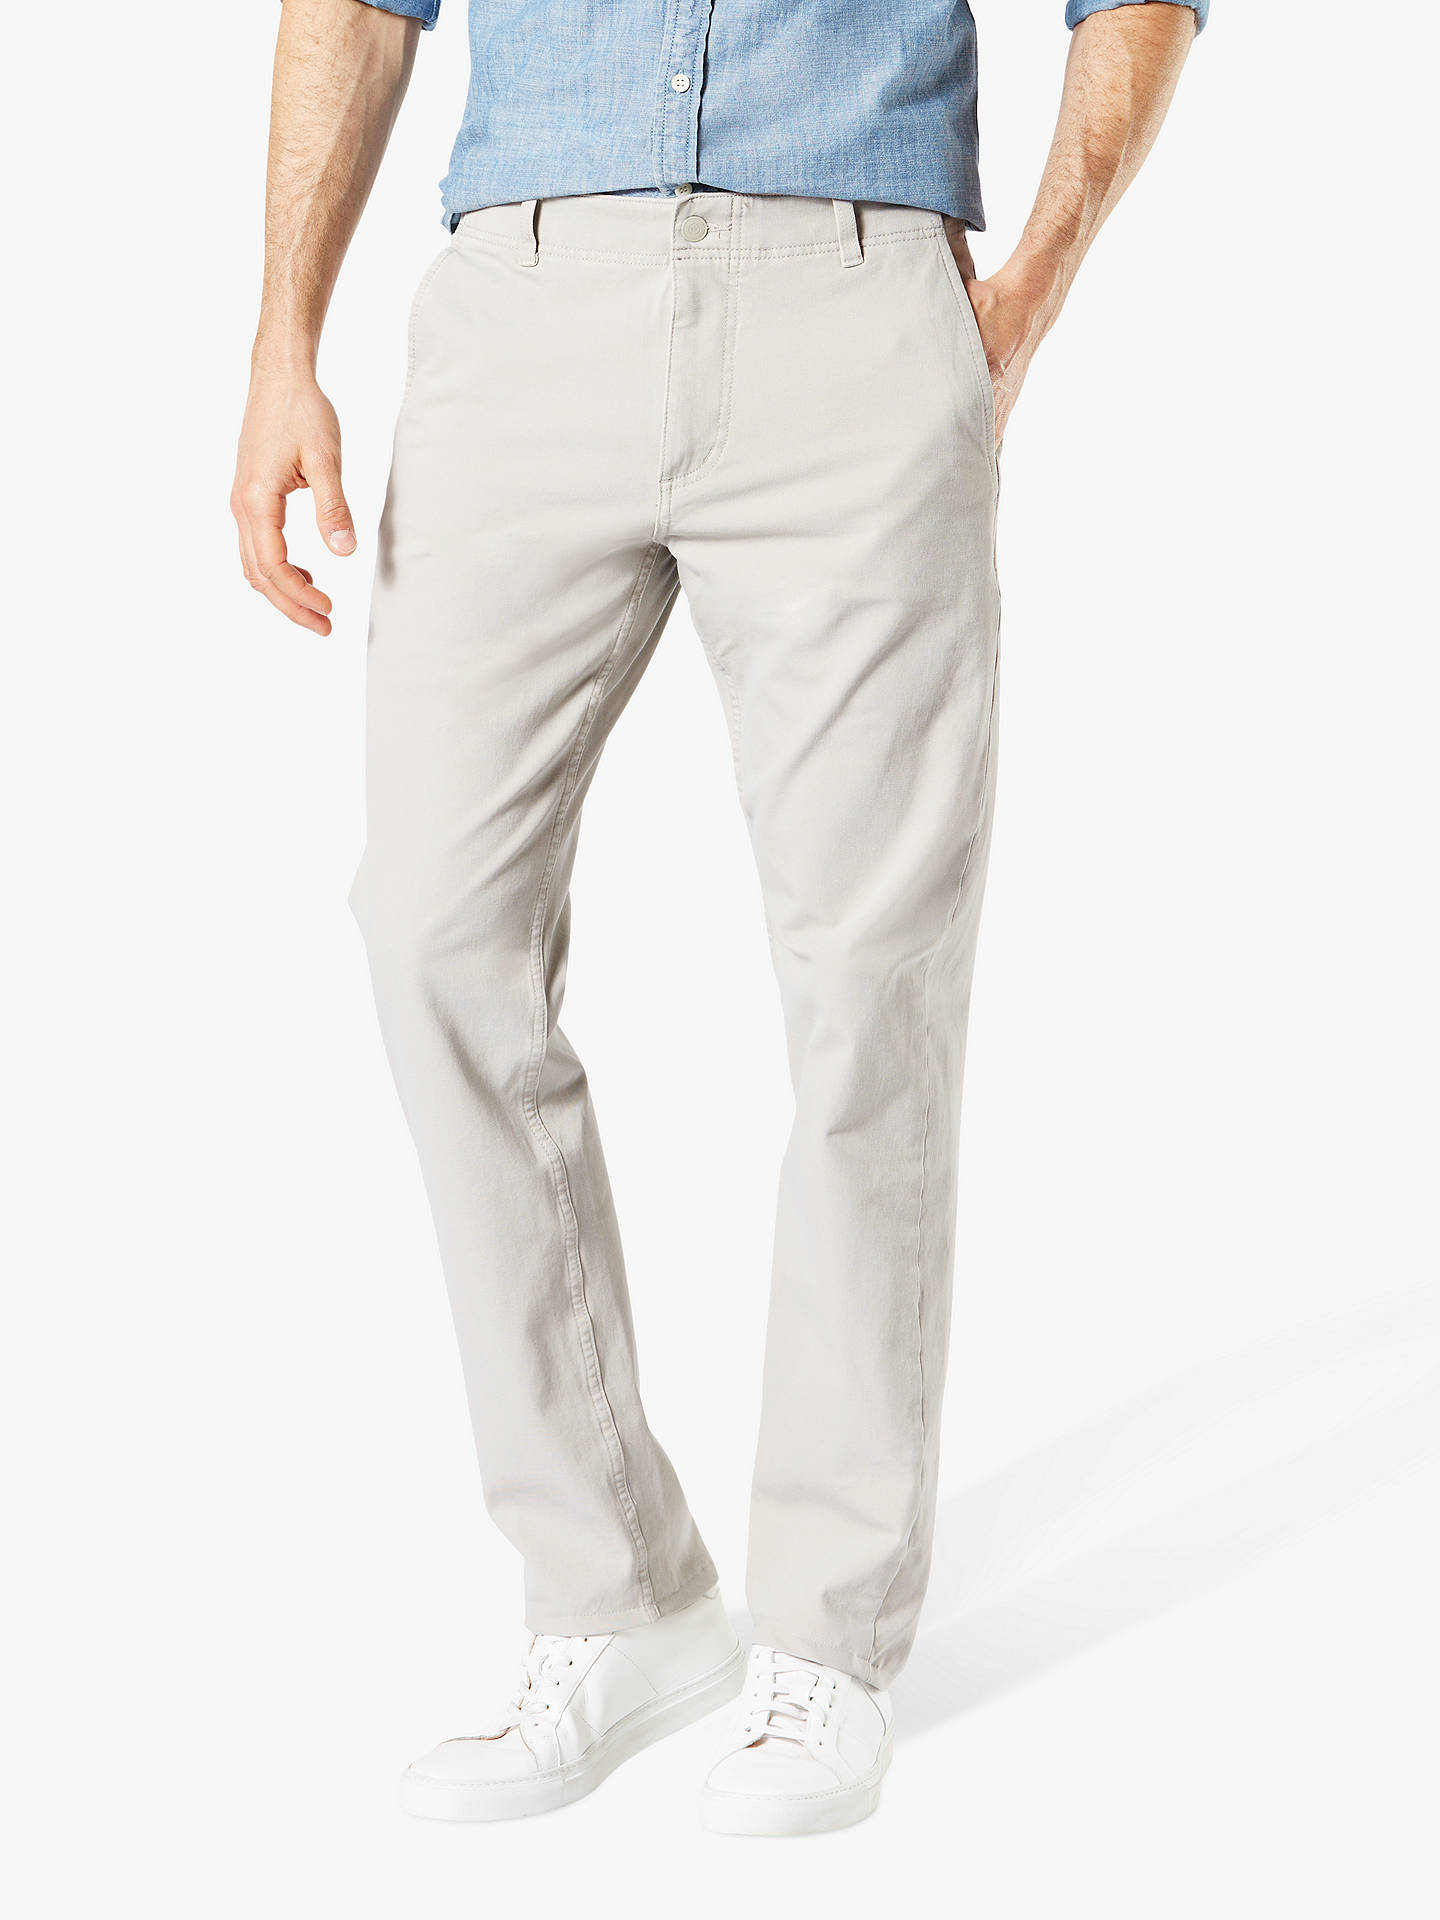 22c7c8d5392505 Buy Dockers Smart 360 Flex Alpha Slim Tapered Trousers, Salix Grey, 32L  Online at ...